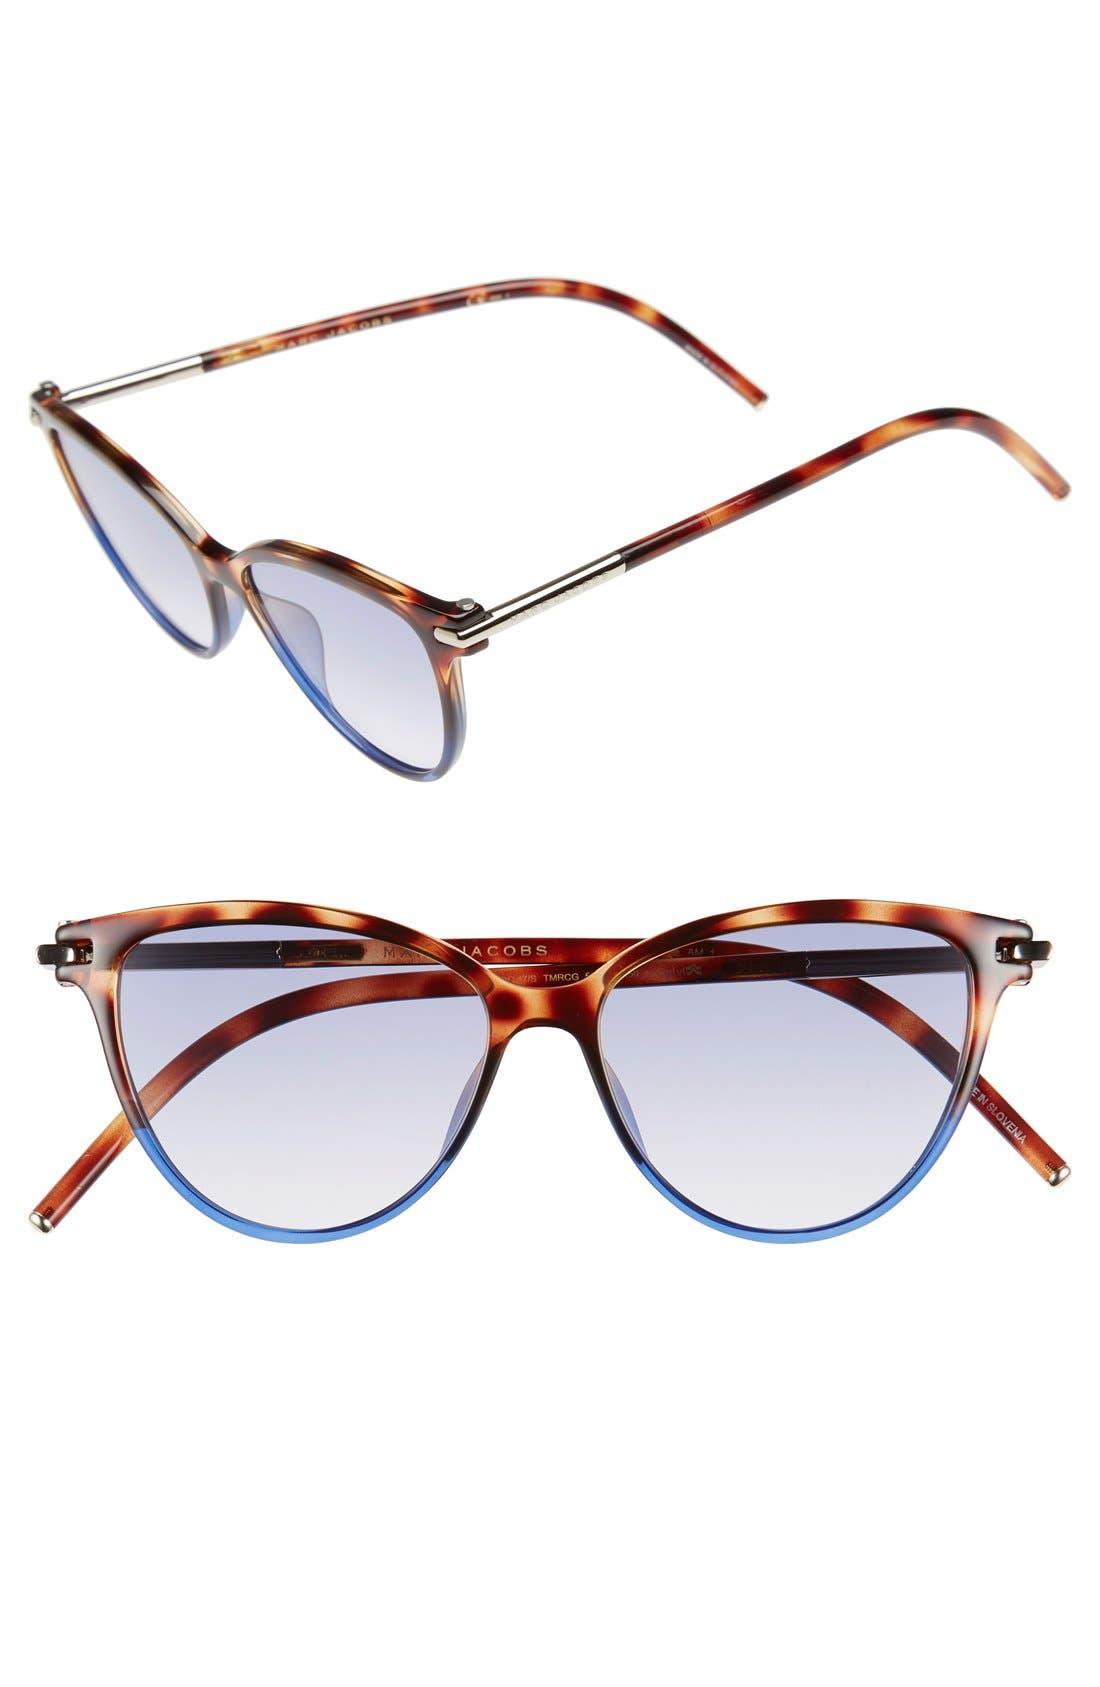 53mm Cat Eye Sunglasses,                         Main,                         color, Havanabrownblue